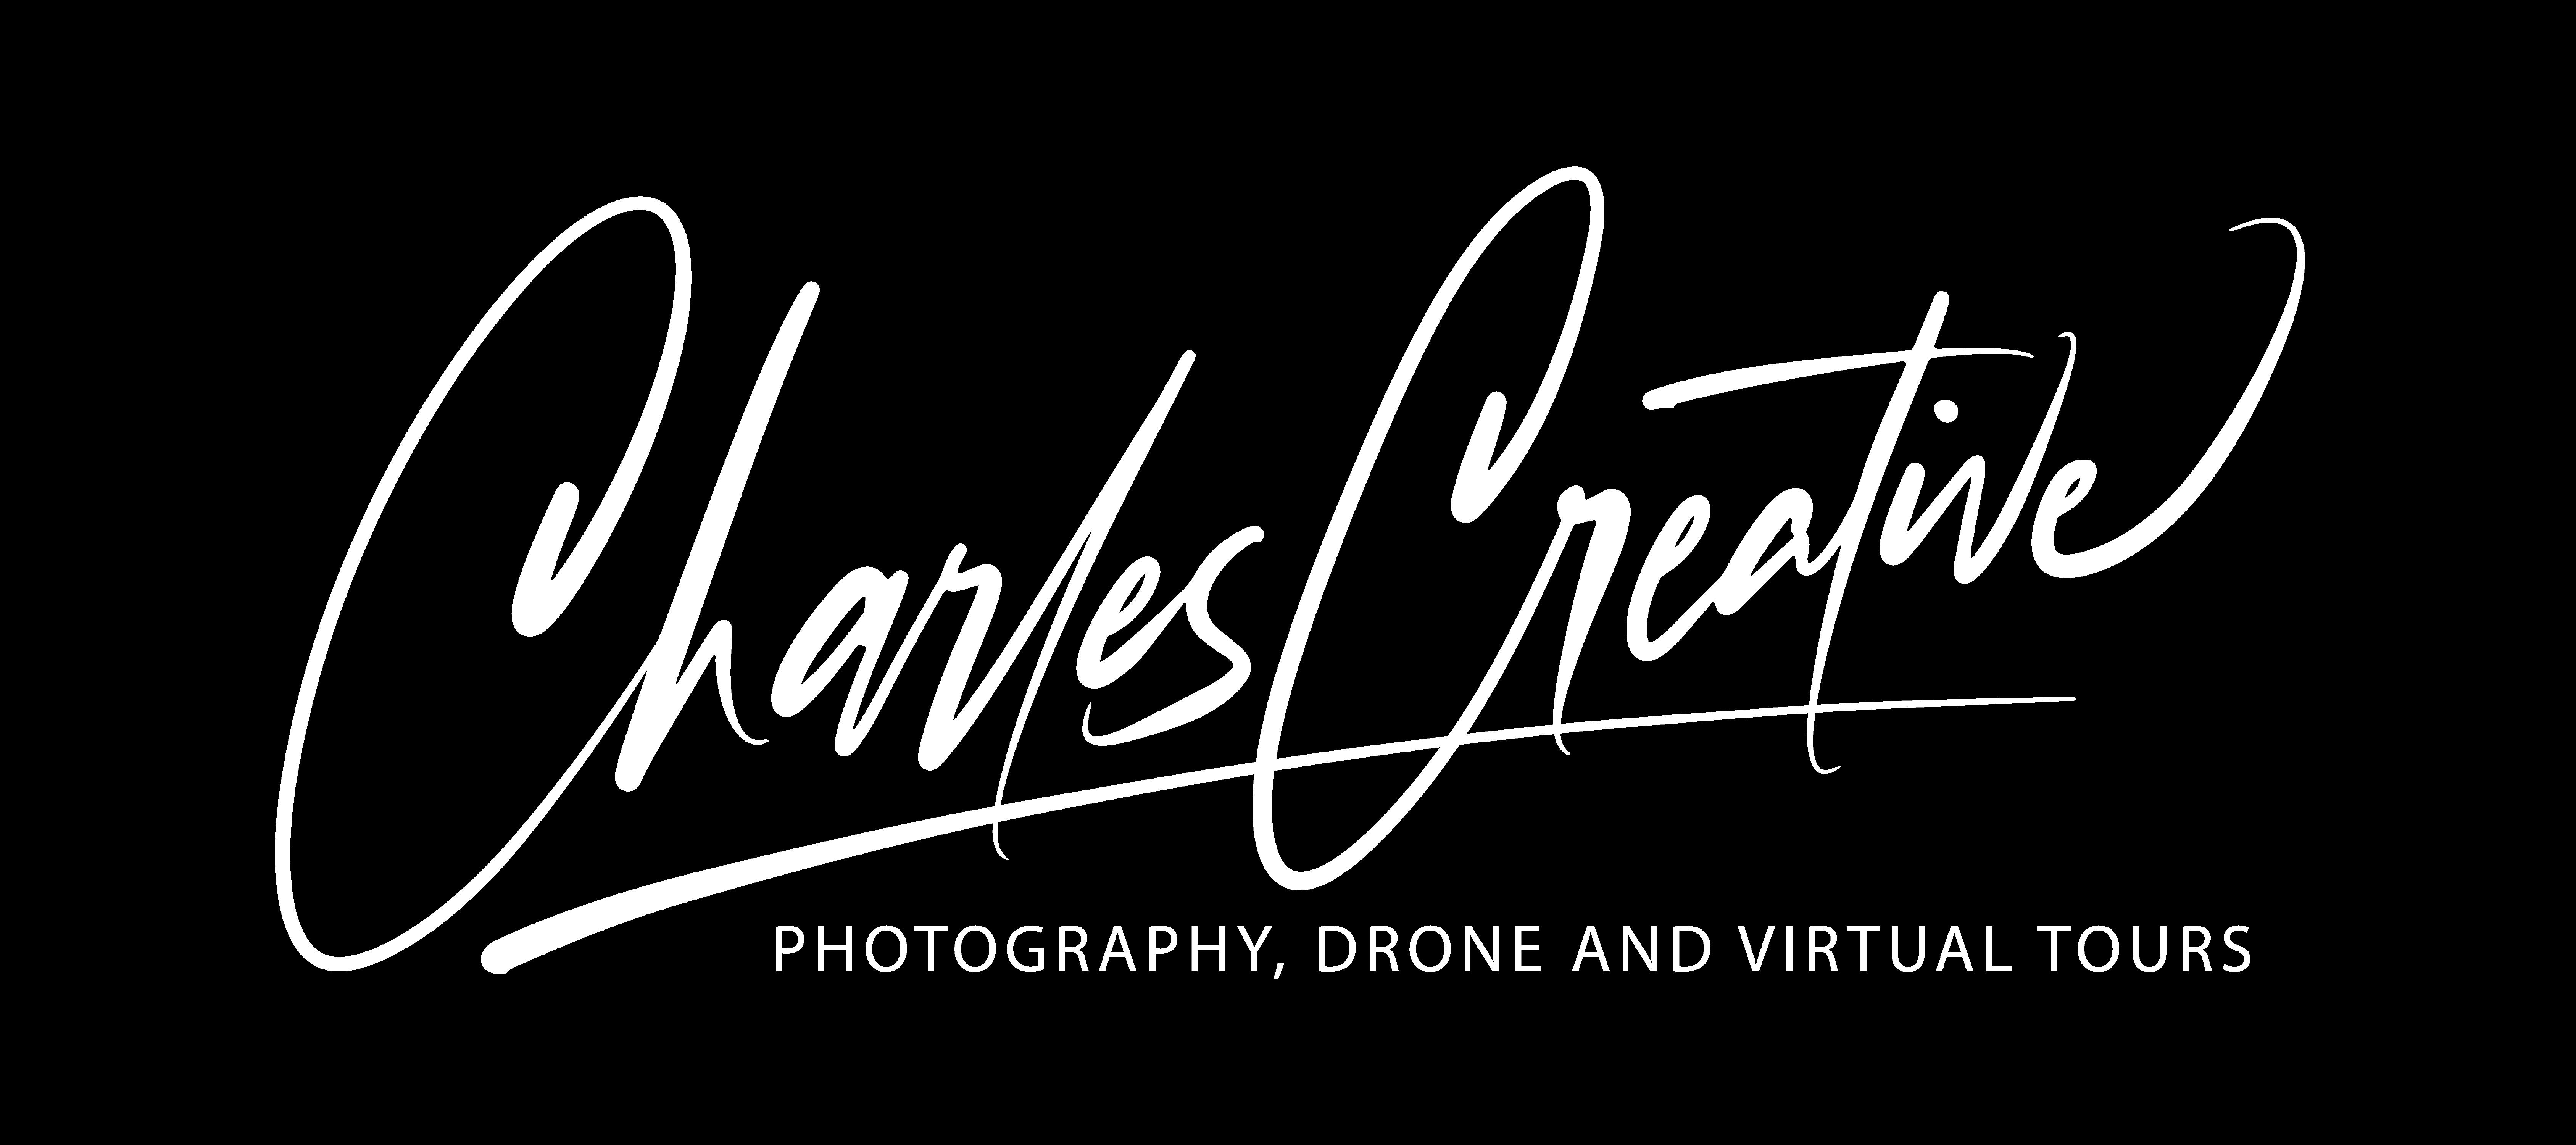 Charles Creative